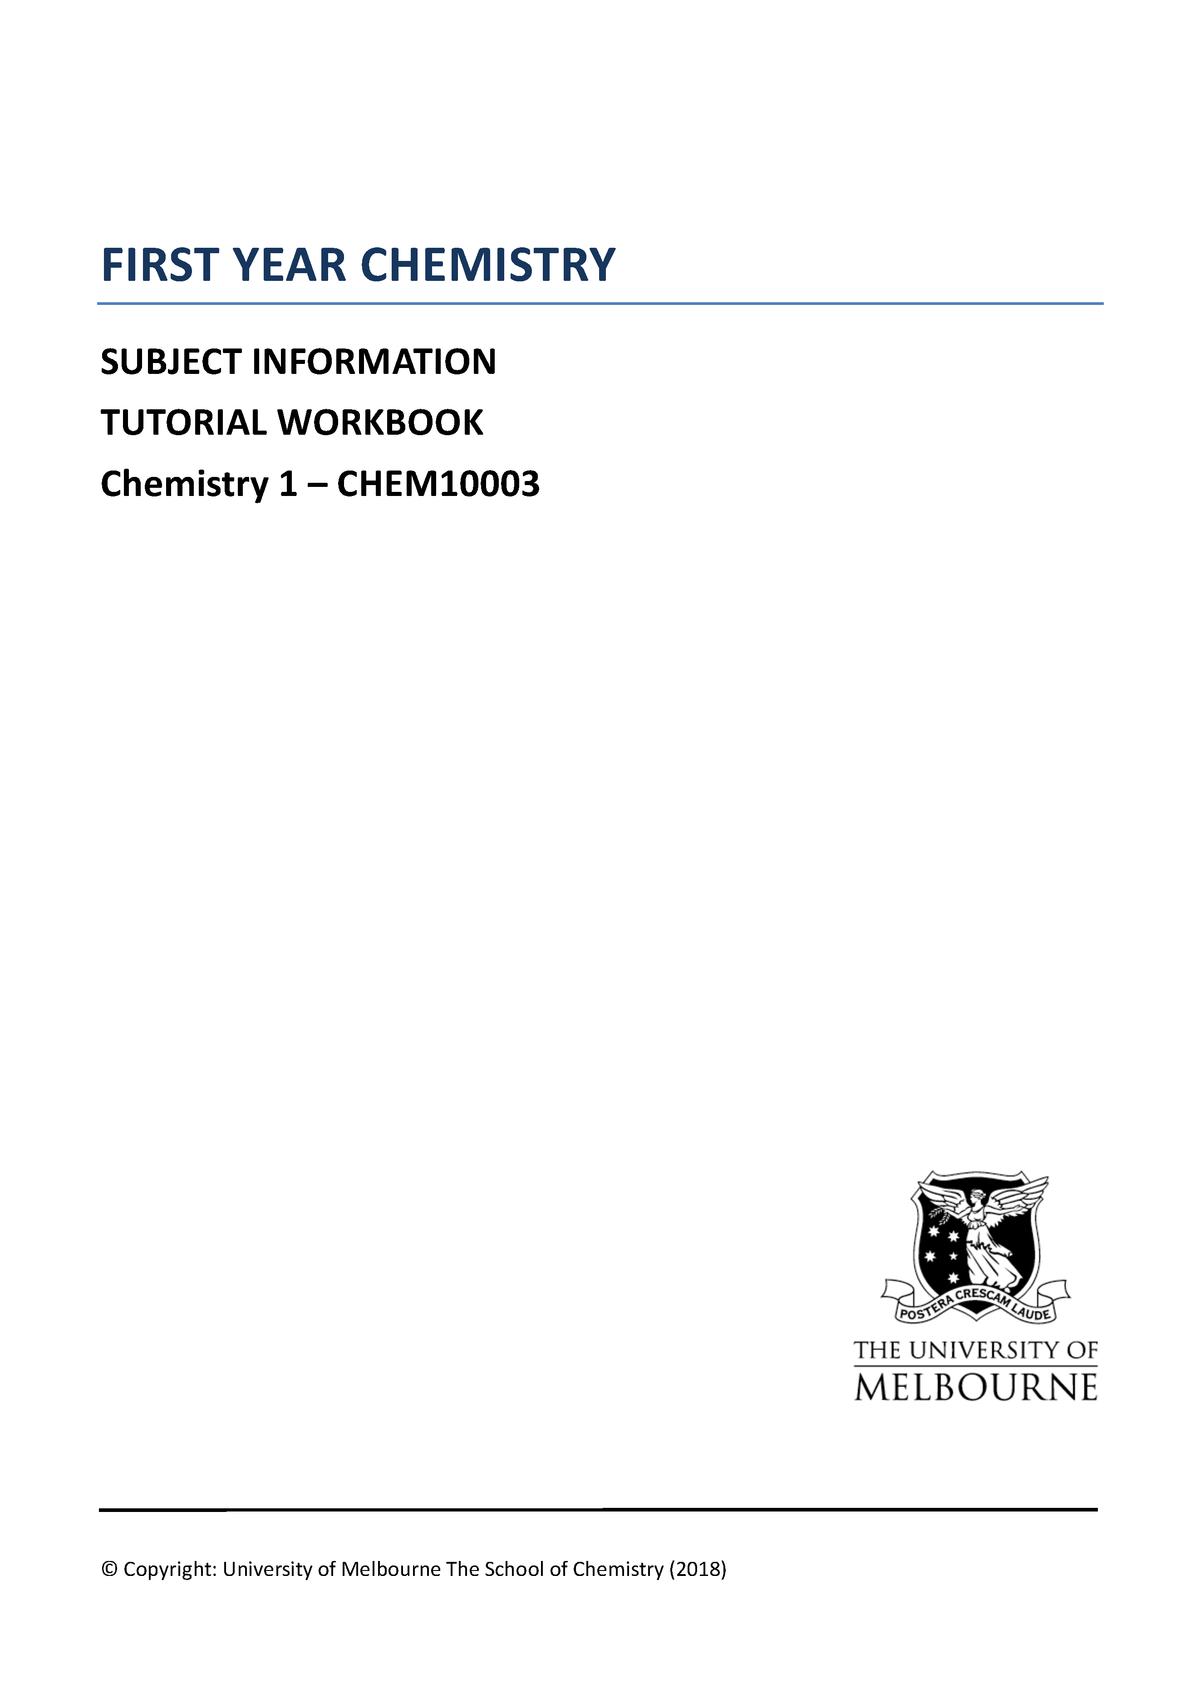 CHEM10003 2018 Tut Workbook - B-SCI: Bachelor of Science - StuDocu